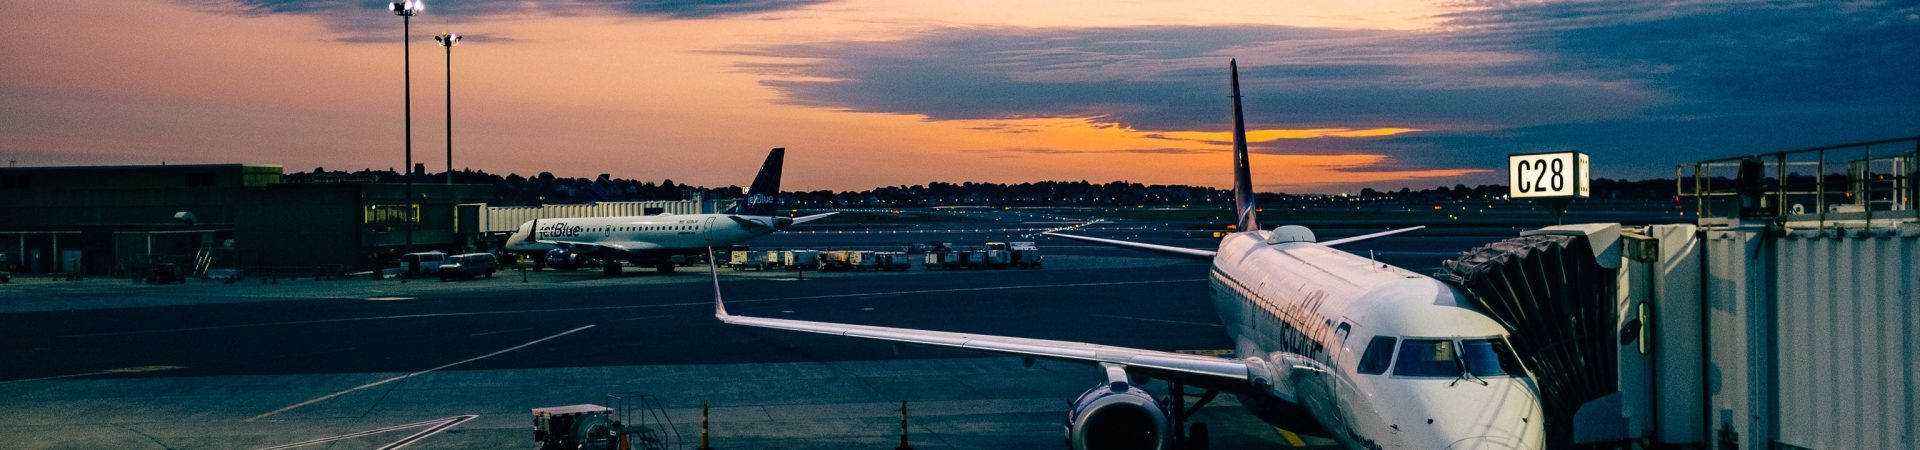 fly og hotel til Alicante